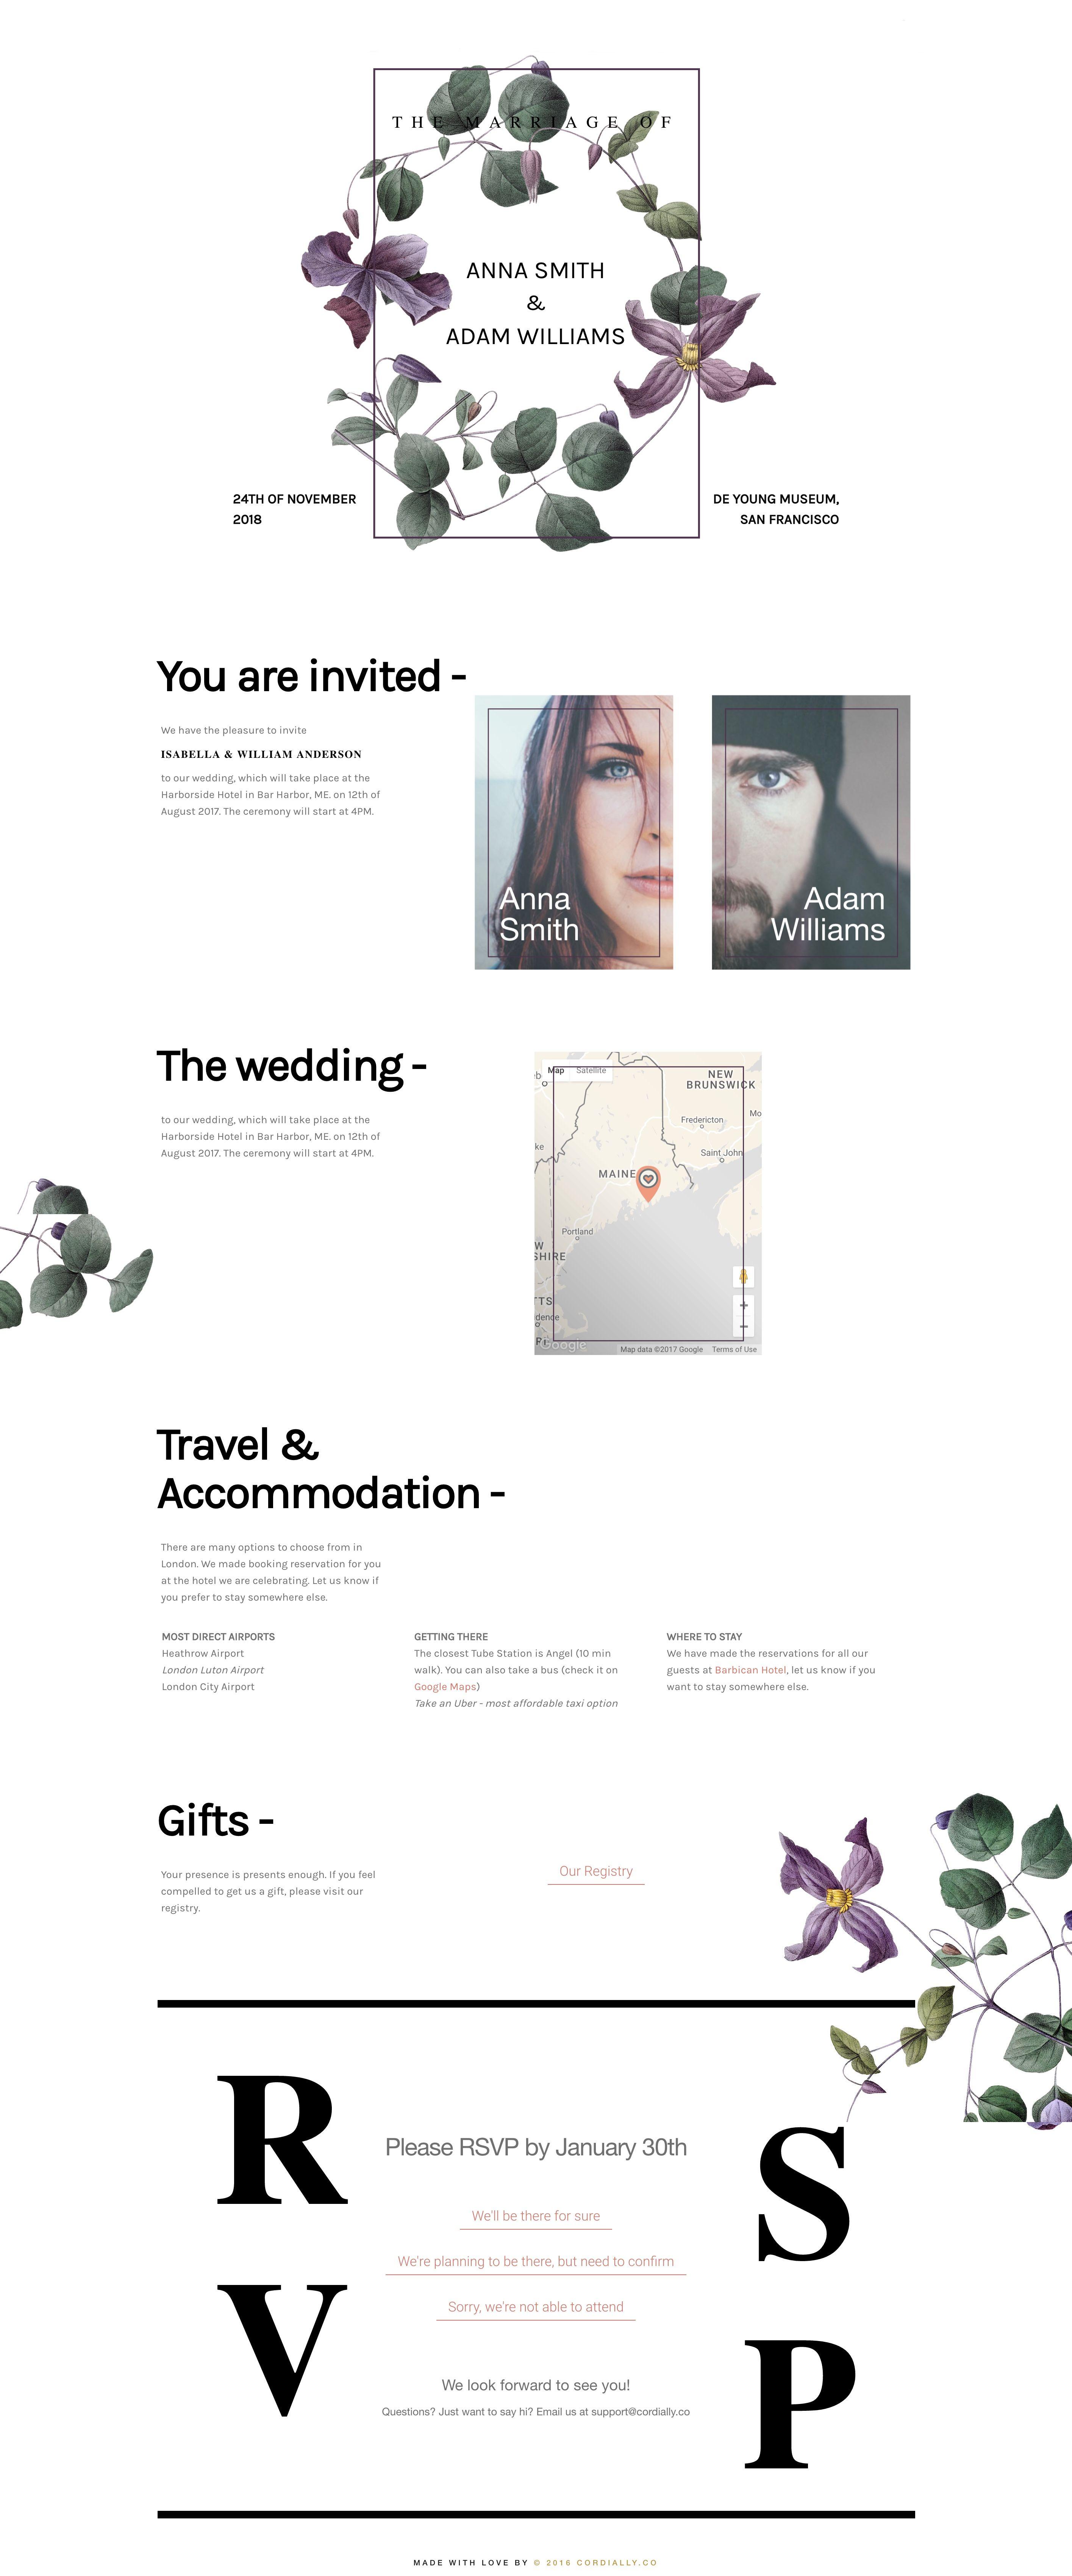 Greenery online wedding invitation for design savvy people ...